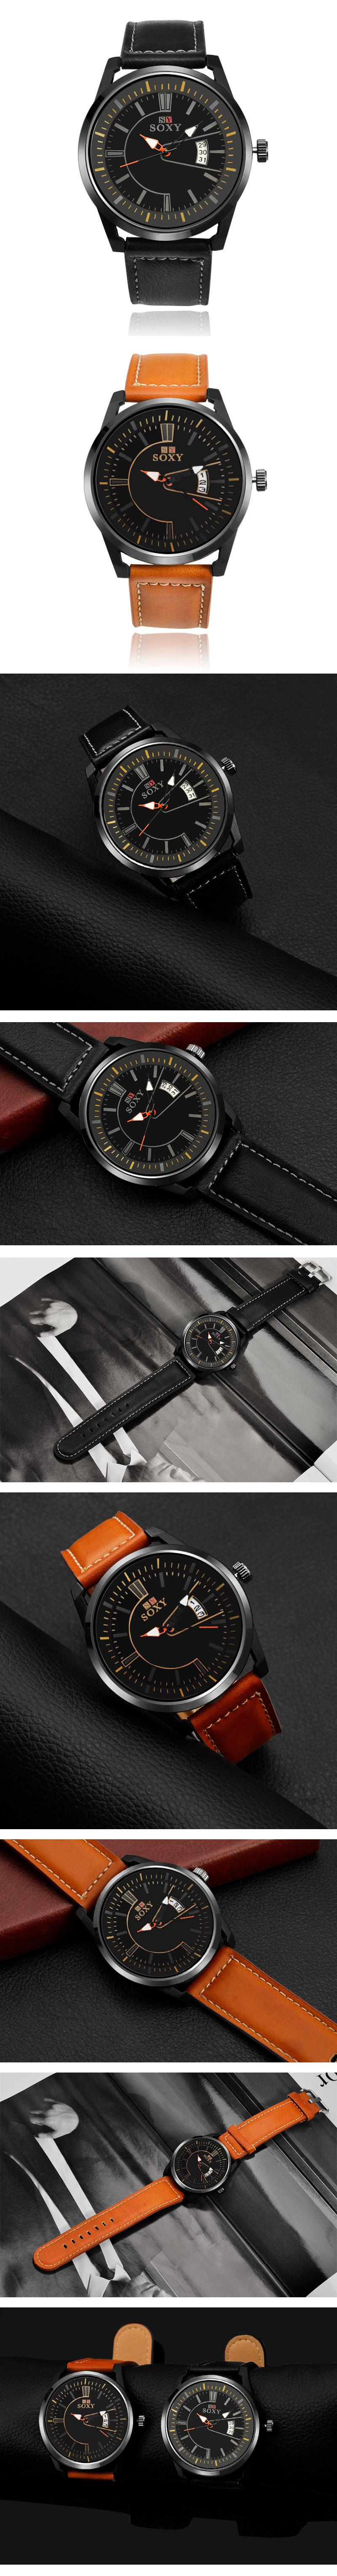 SOXY 0100 Ultra Thin Fashion Leather Strap Men Quartz Watch